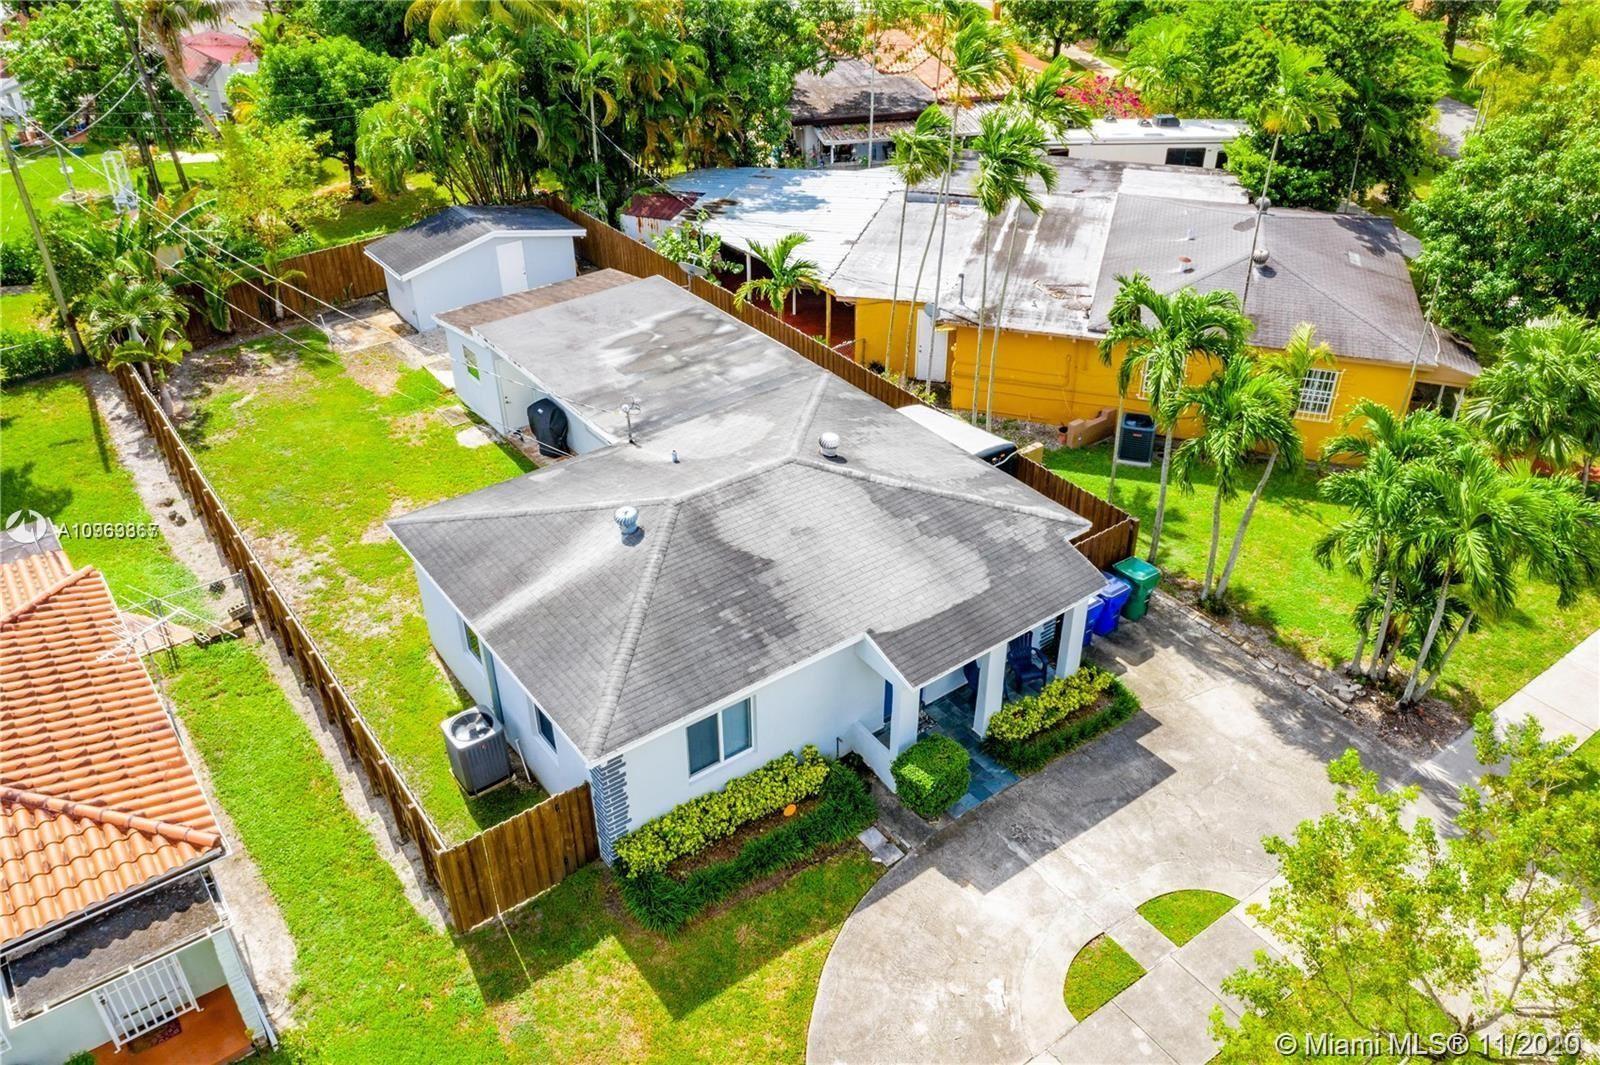 6340 Tamiami Canal Rd, Miami, FL 33126 - #: A10963867